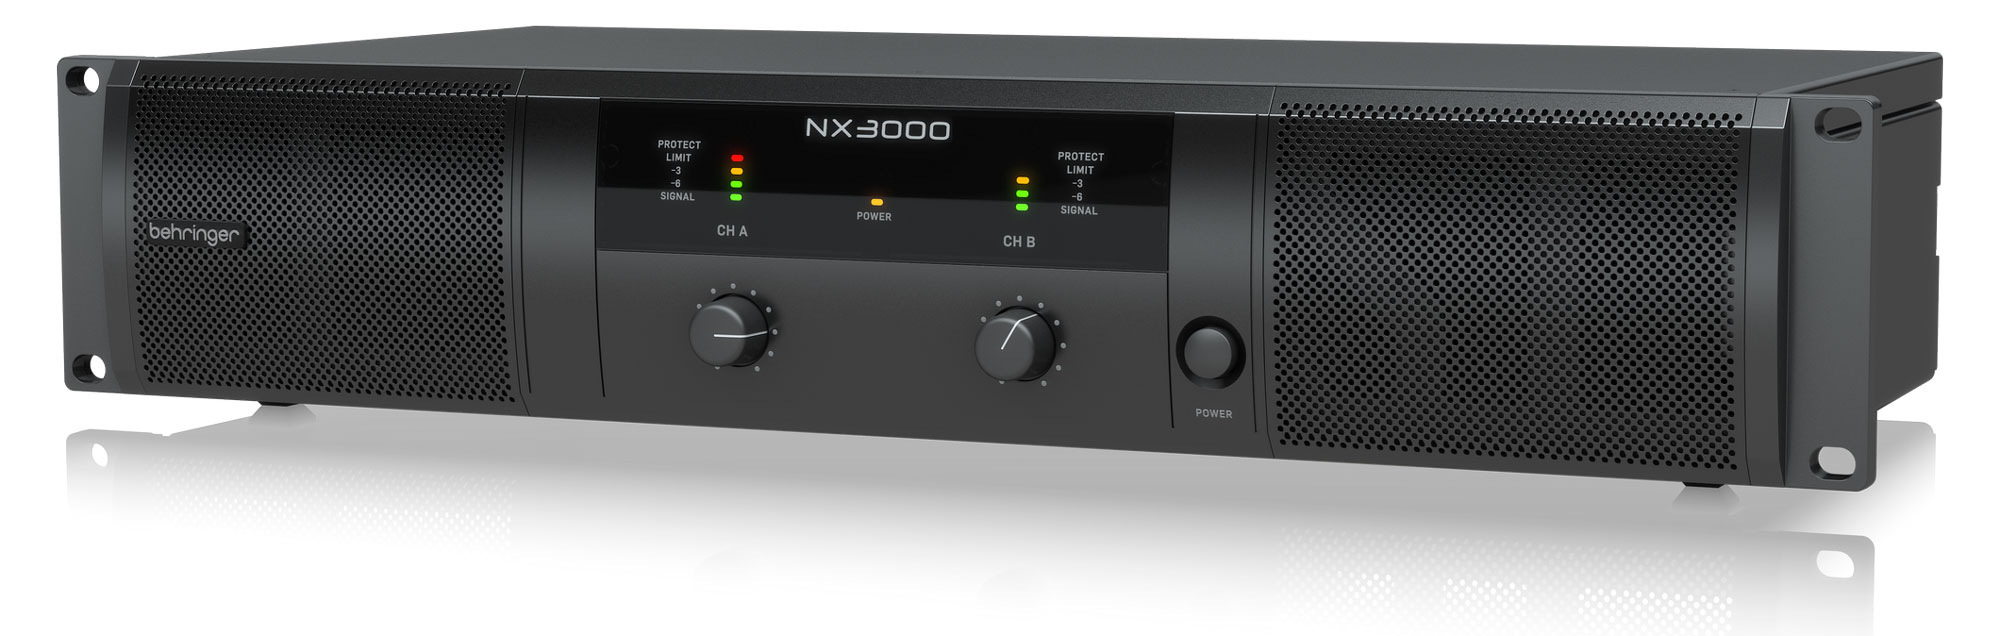 Paendstufen - Behringer NX3000 Endstufe - Onlineshop Musikhaus Kirstein